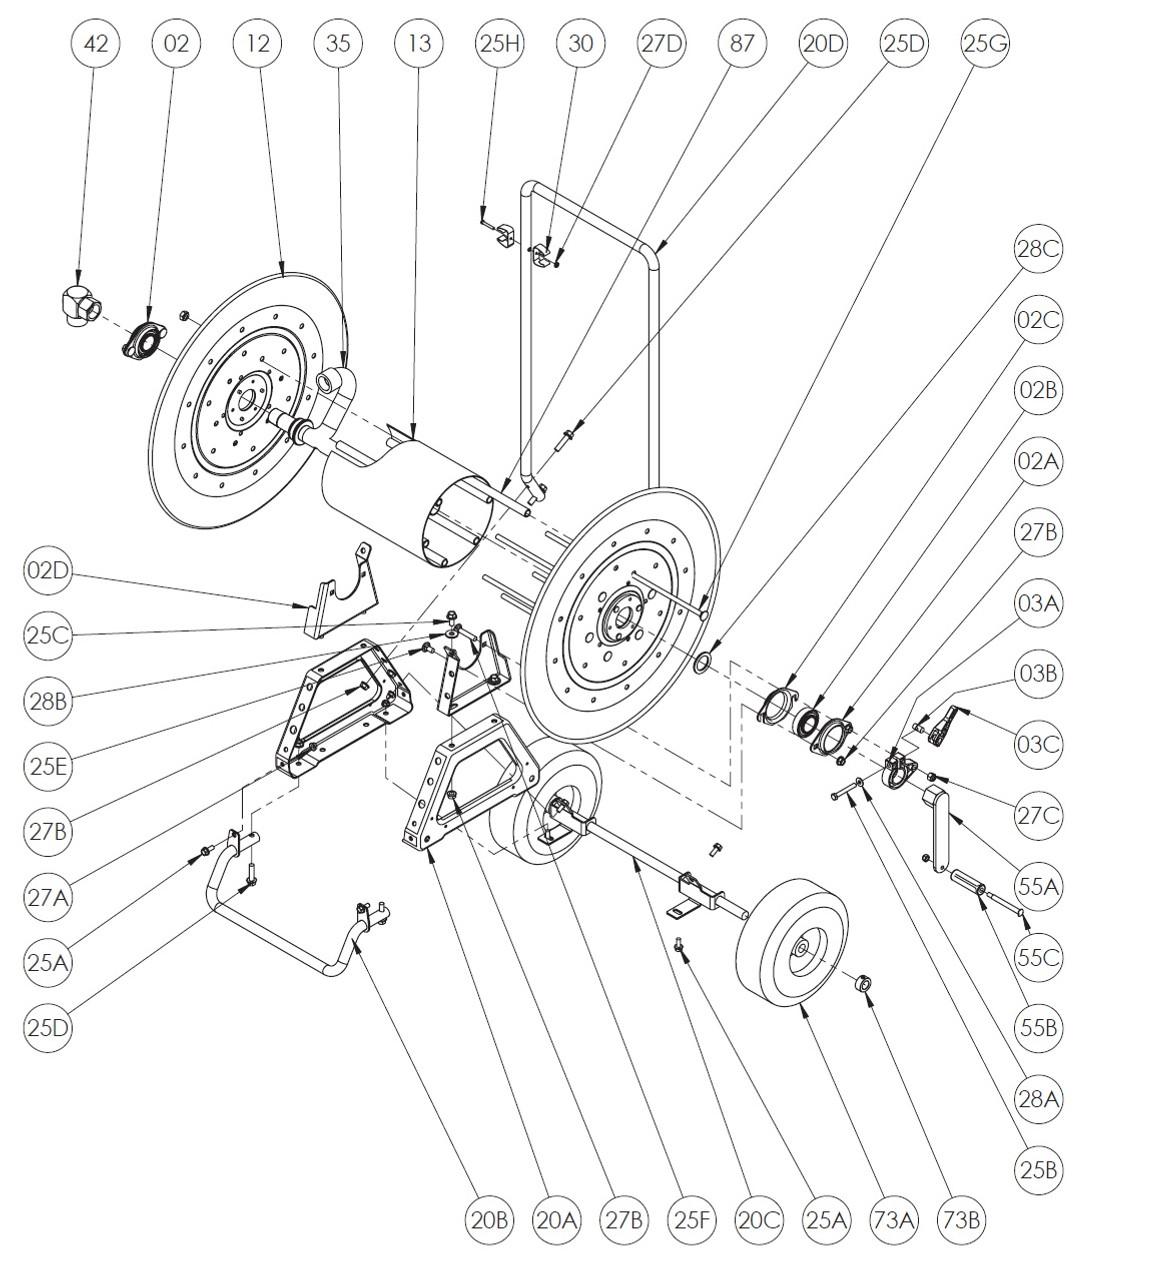 at series mobile garden hose reel parts 1 bearing plete 02a  at series mobile garden hose reel parts 1 bearing plete 02a 02b 02c john m ellsworth co inc